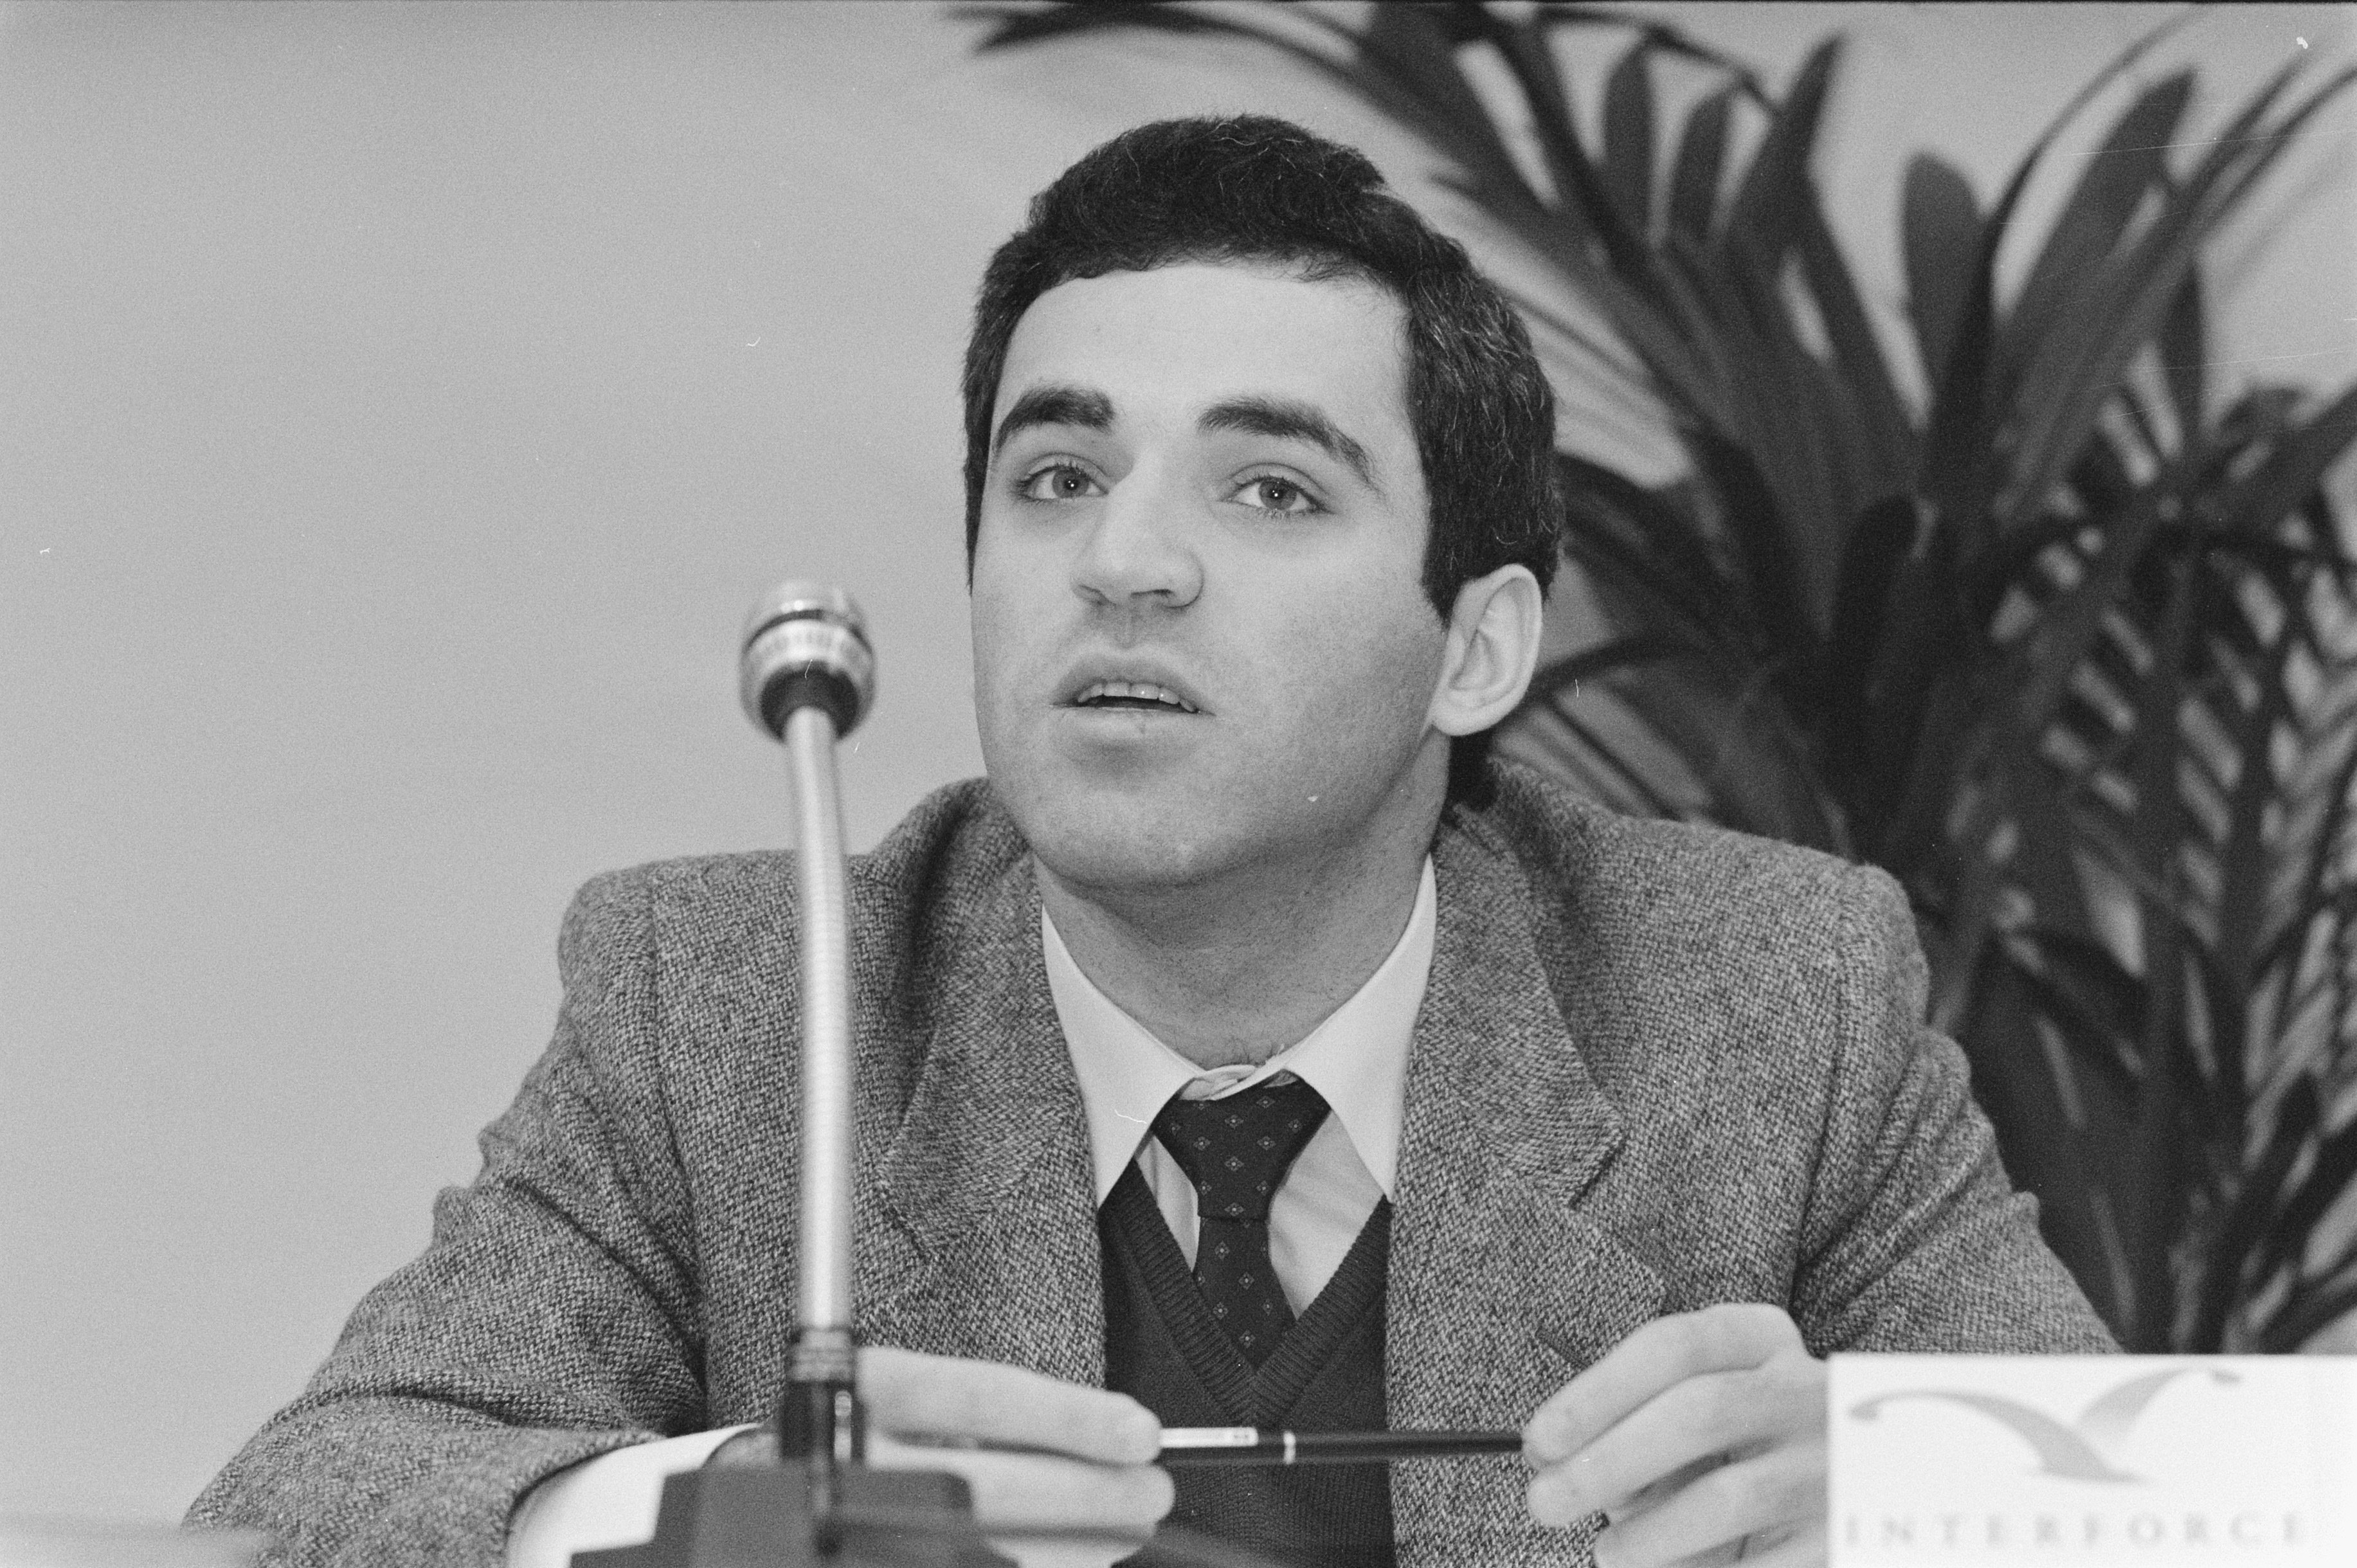 File:Persconferentie Grandmasters Association Garri Kasparov